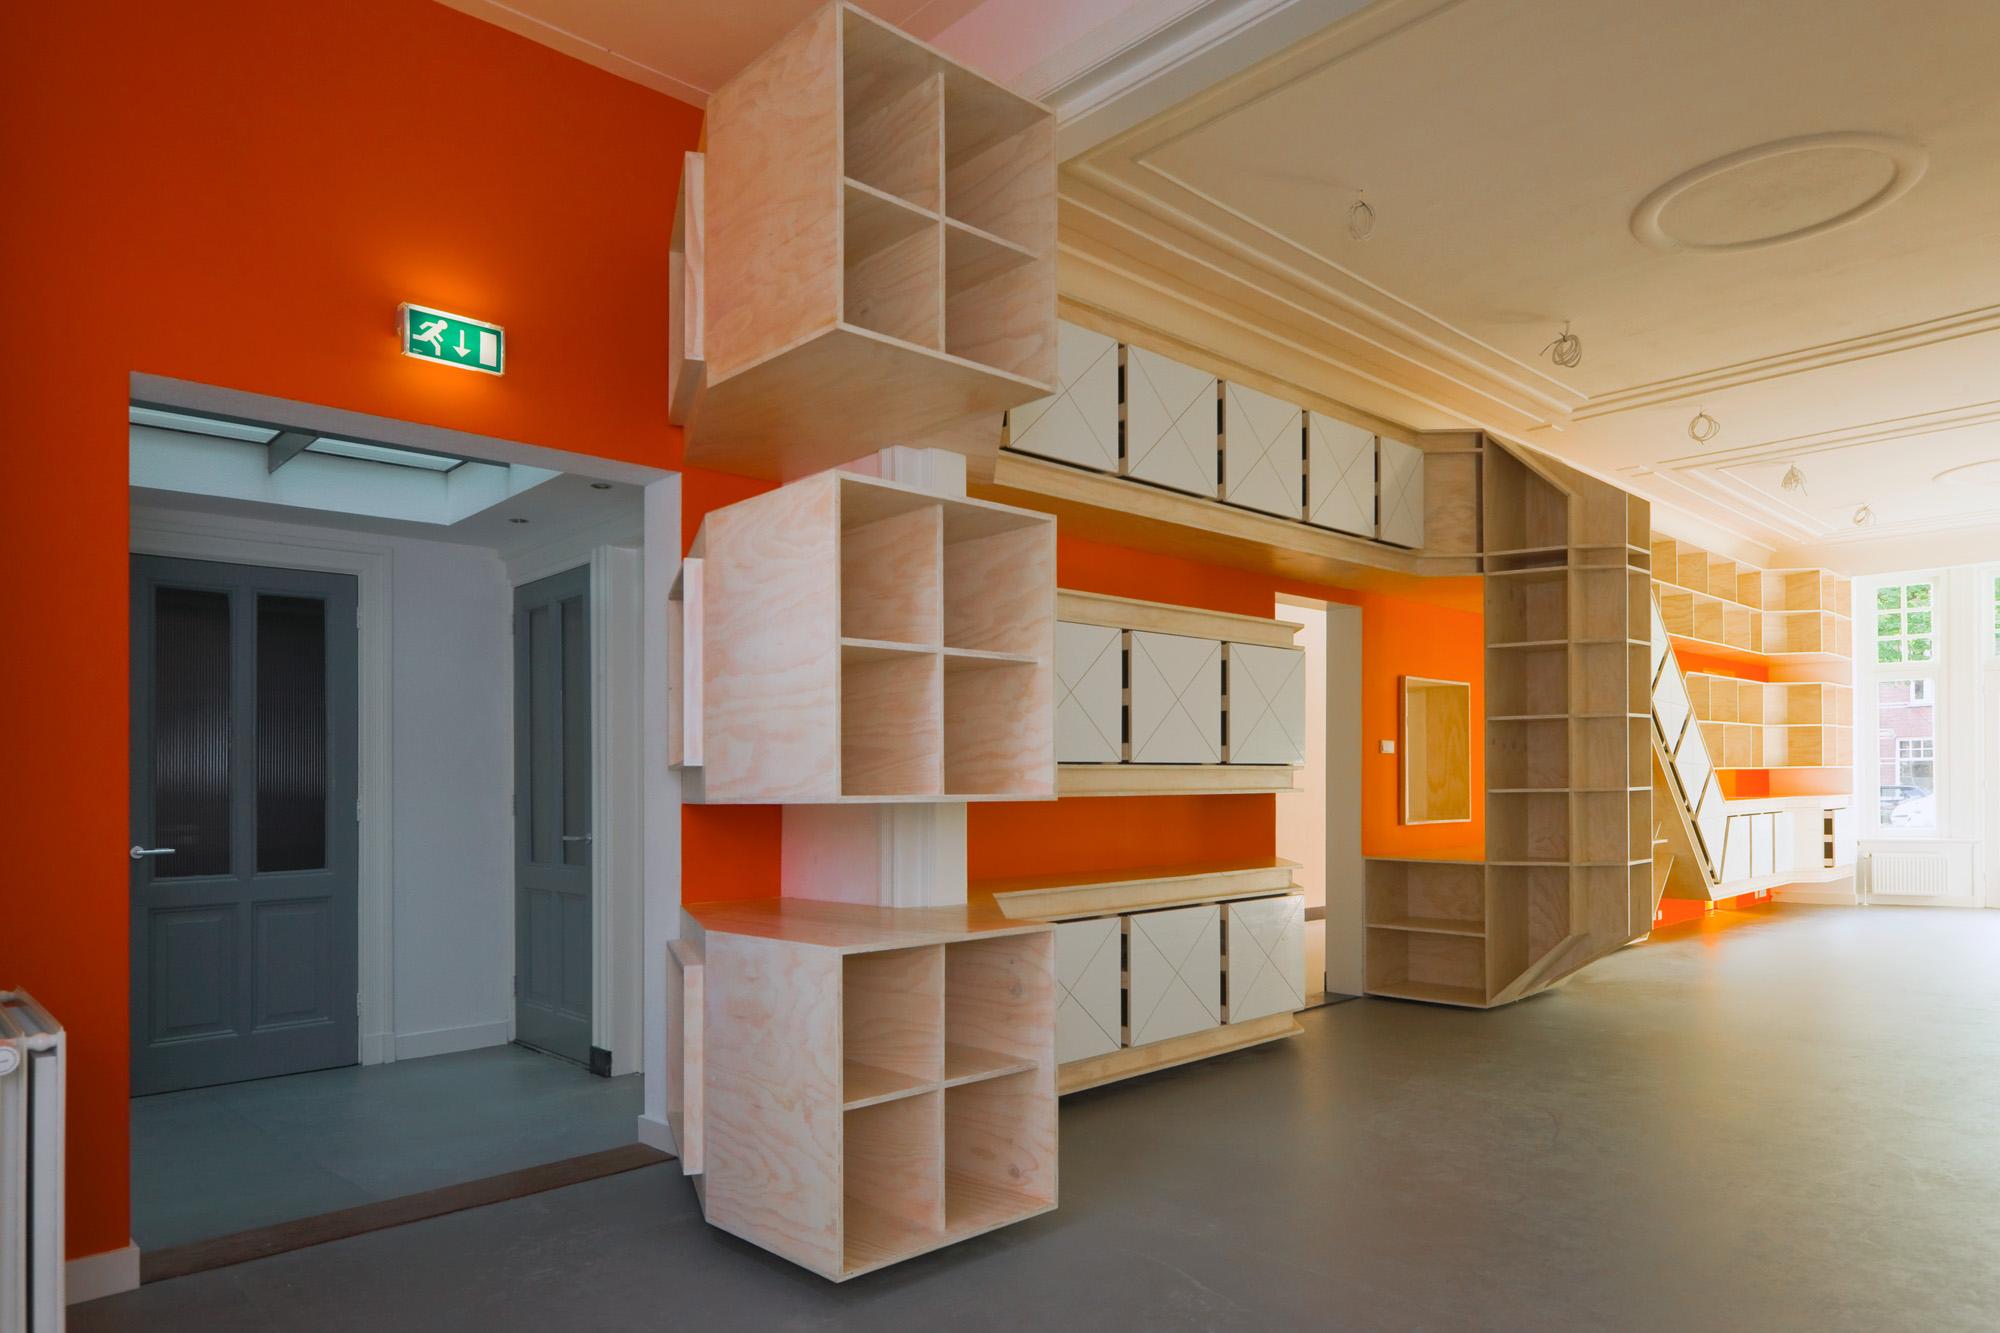 114 s hertogenbosch hilberink bosch for Interieur kabinet